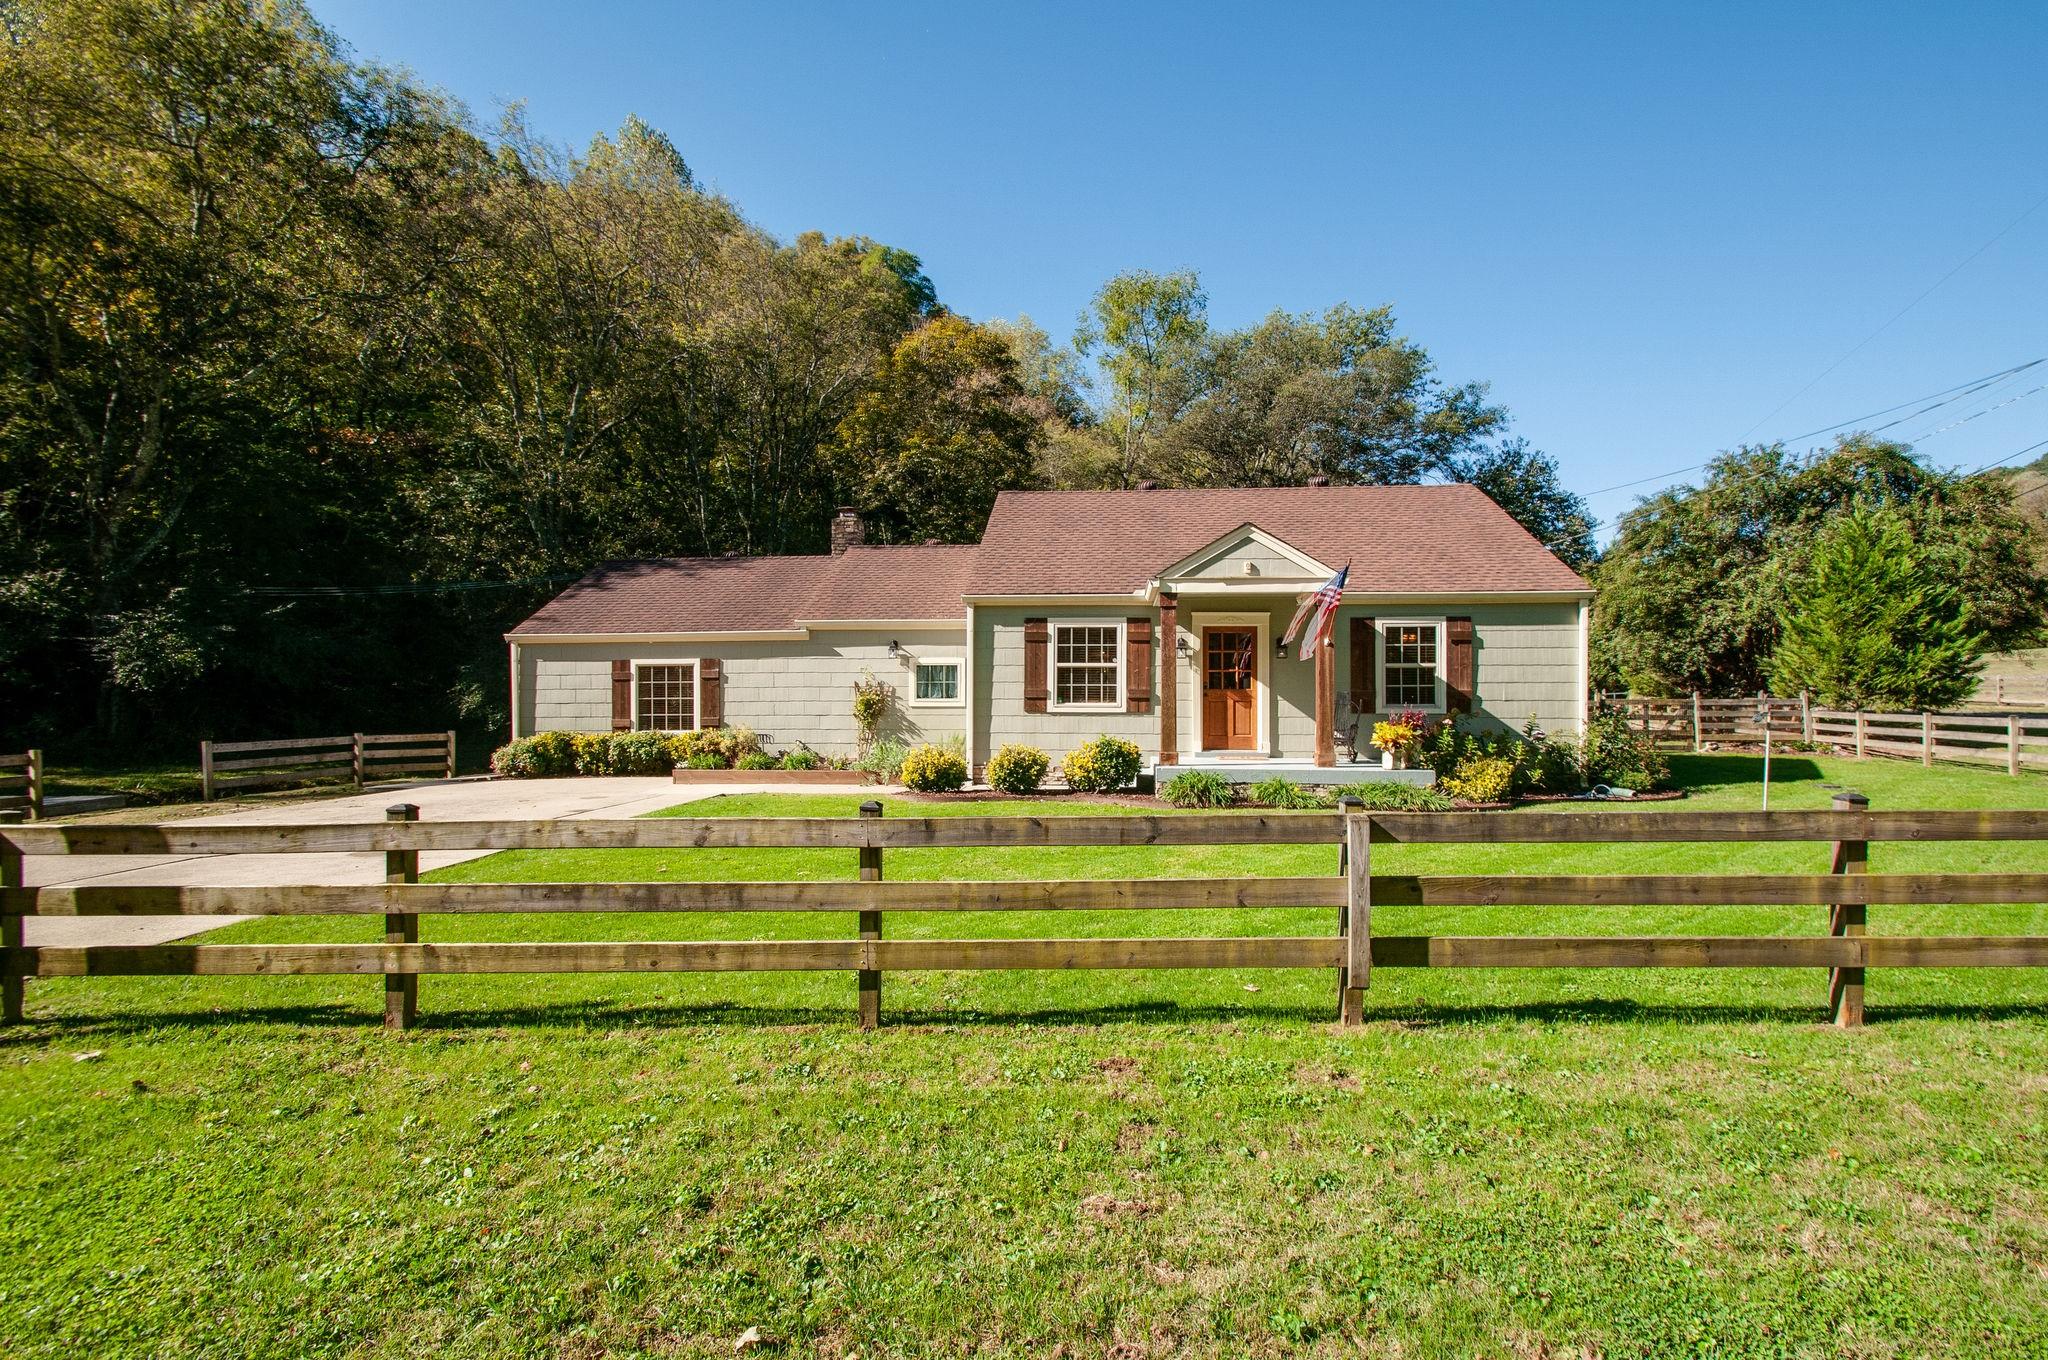 4255 Dry Fork Rd, Whites Creek, TN 37189 - Whites Creek, TN real estate listing